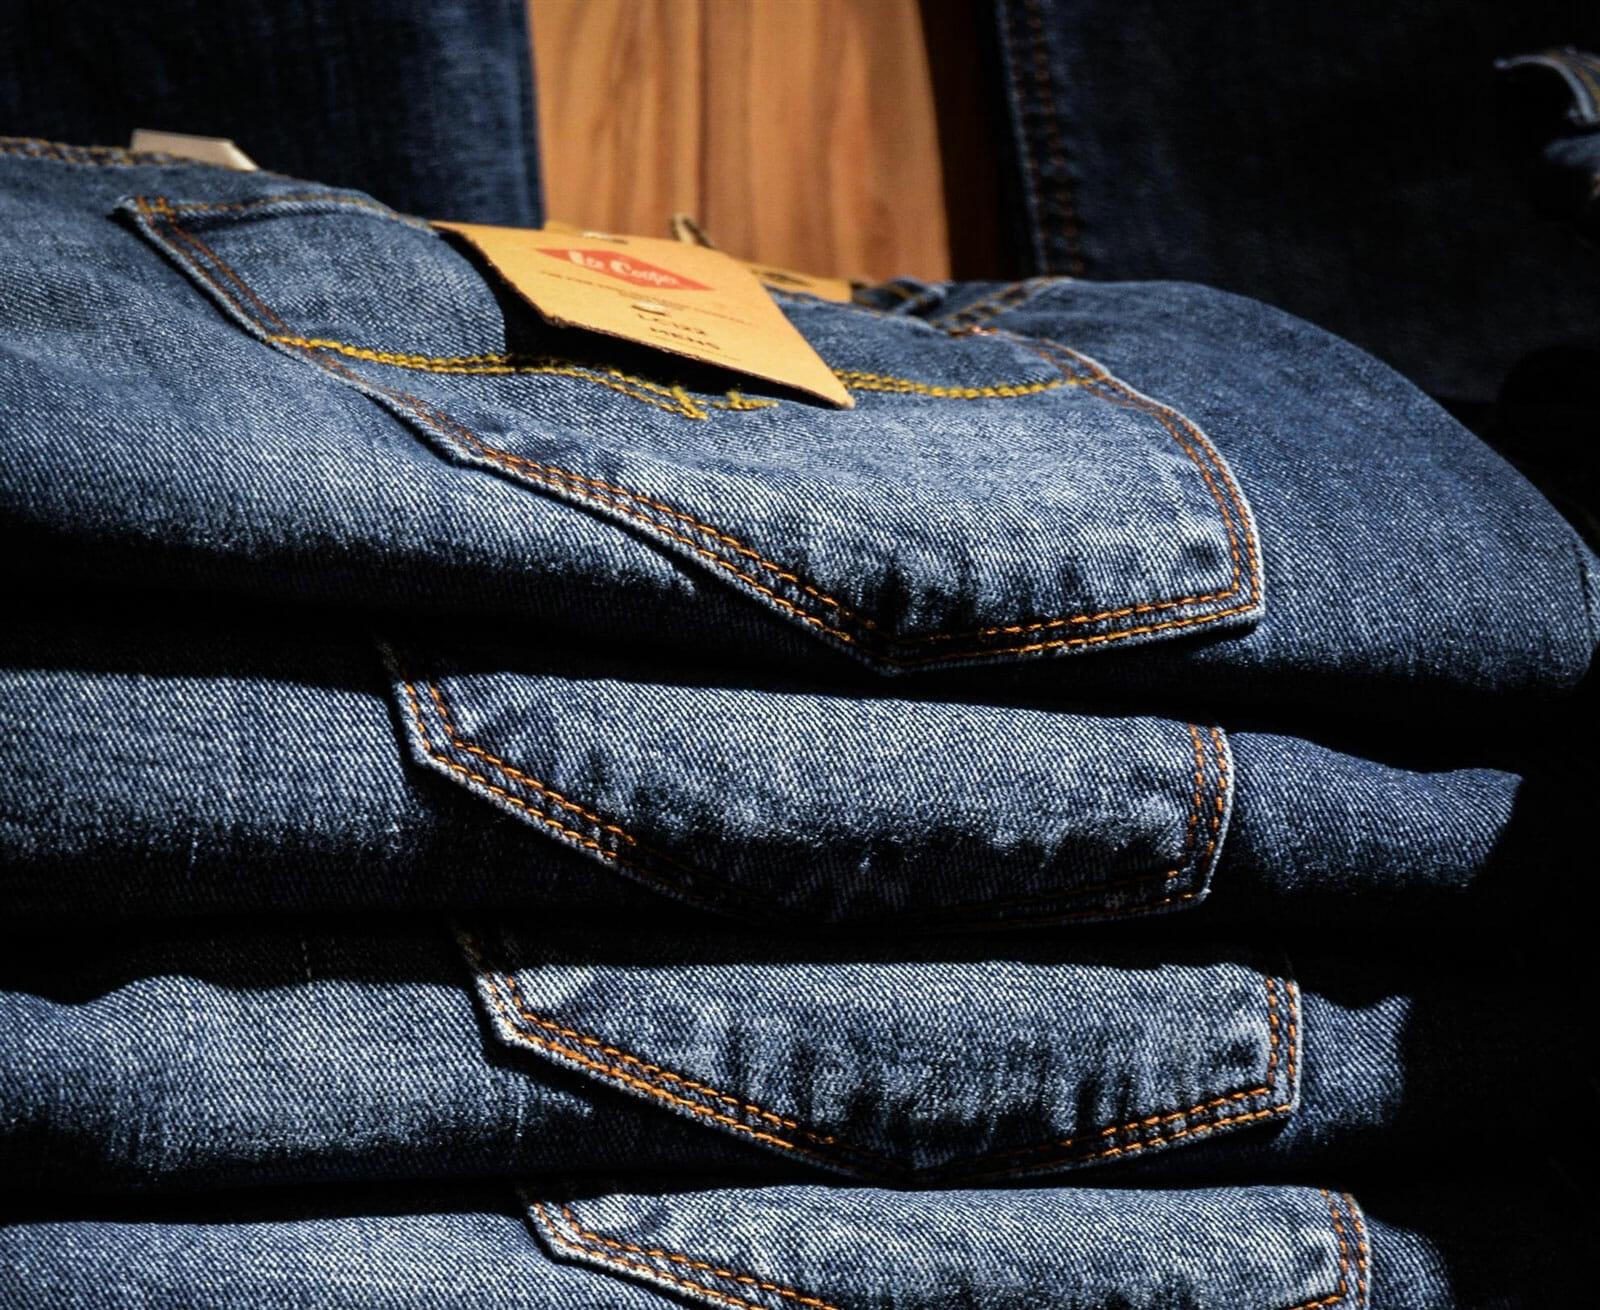 Stack of folded denim jeans